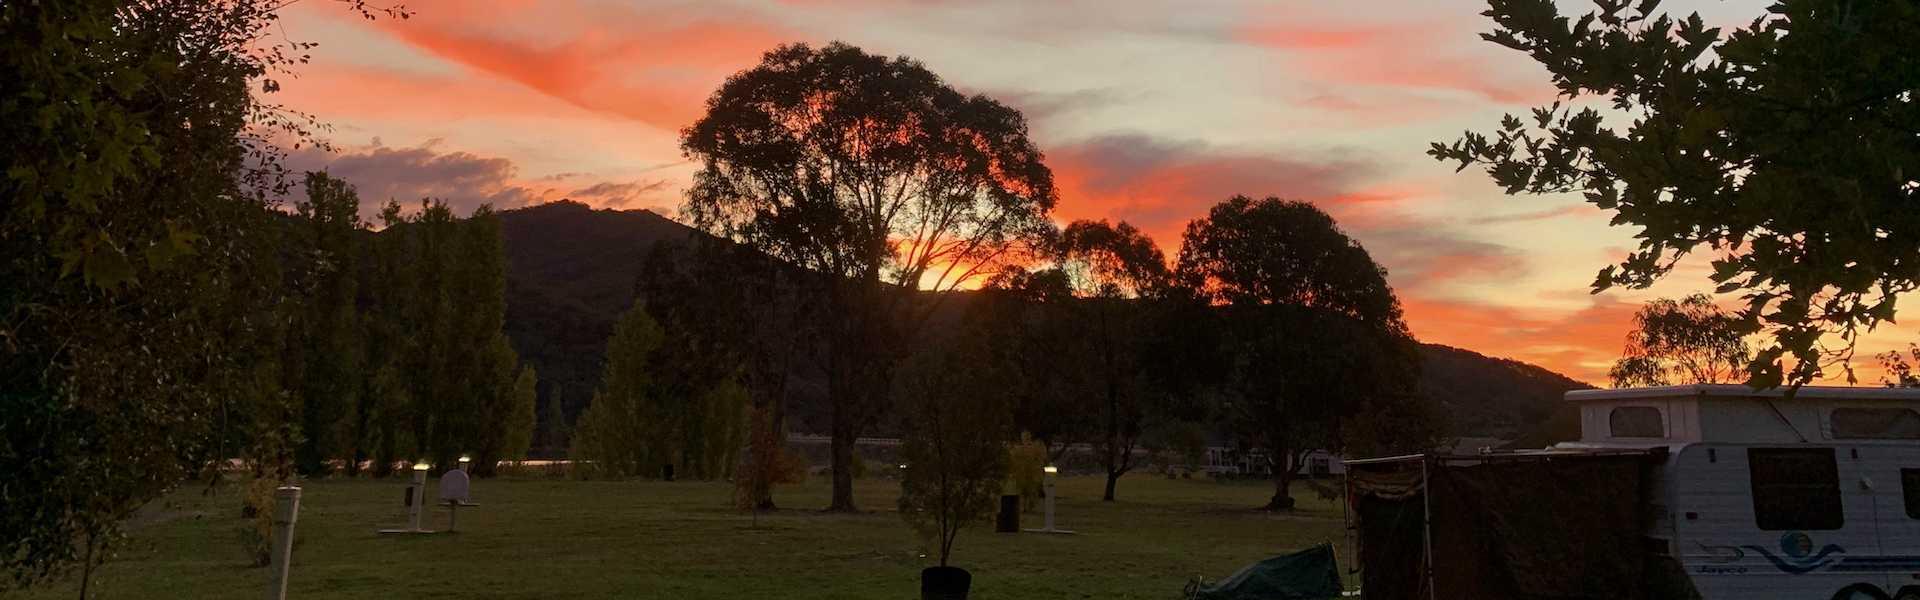 Kui Parks, Khancoban Lakeside Caravan Park NSW